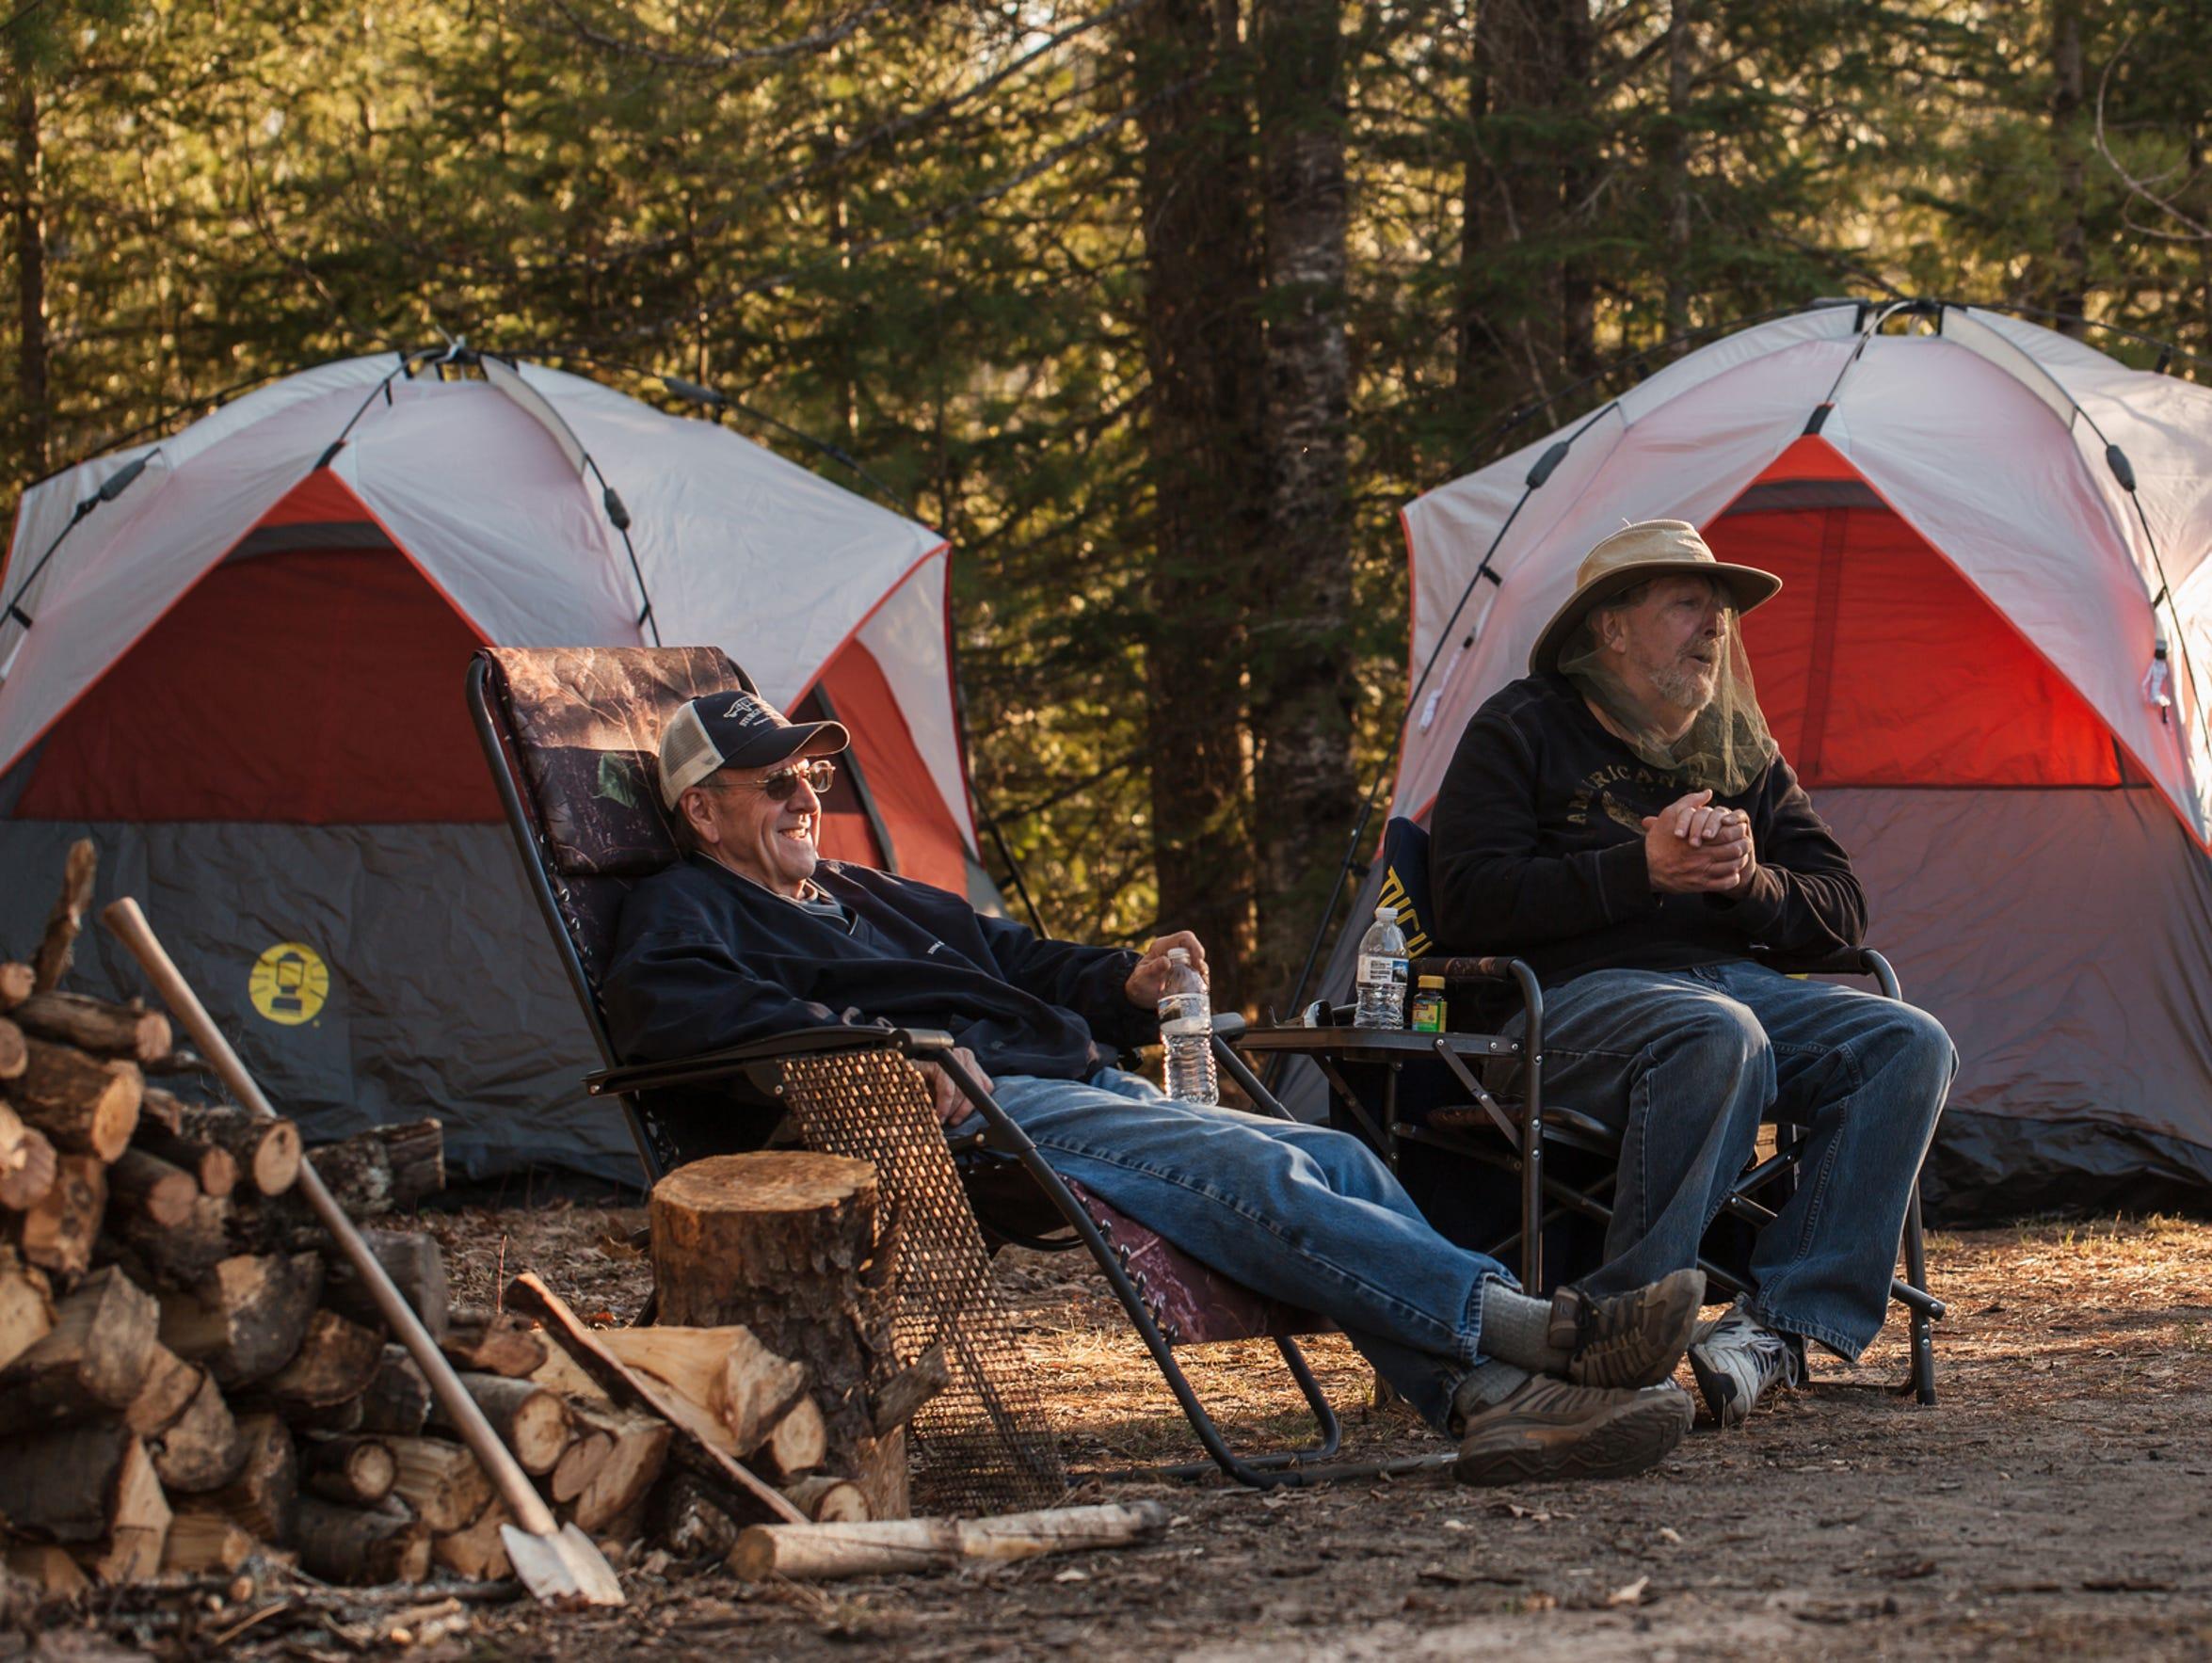 Dale Kennicott (left), 68, of West Branch and Ed Ptasznik,